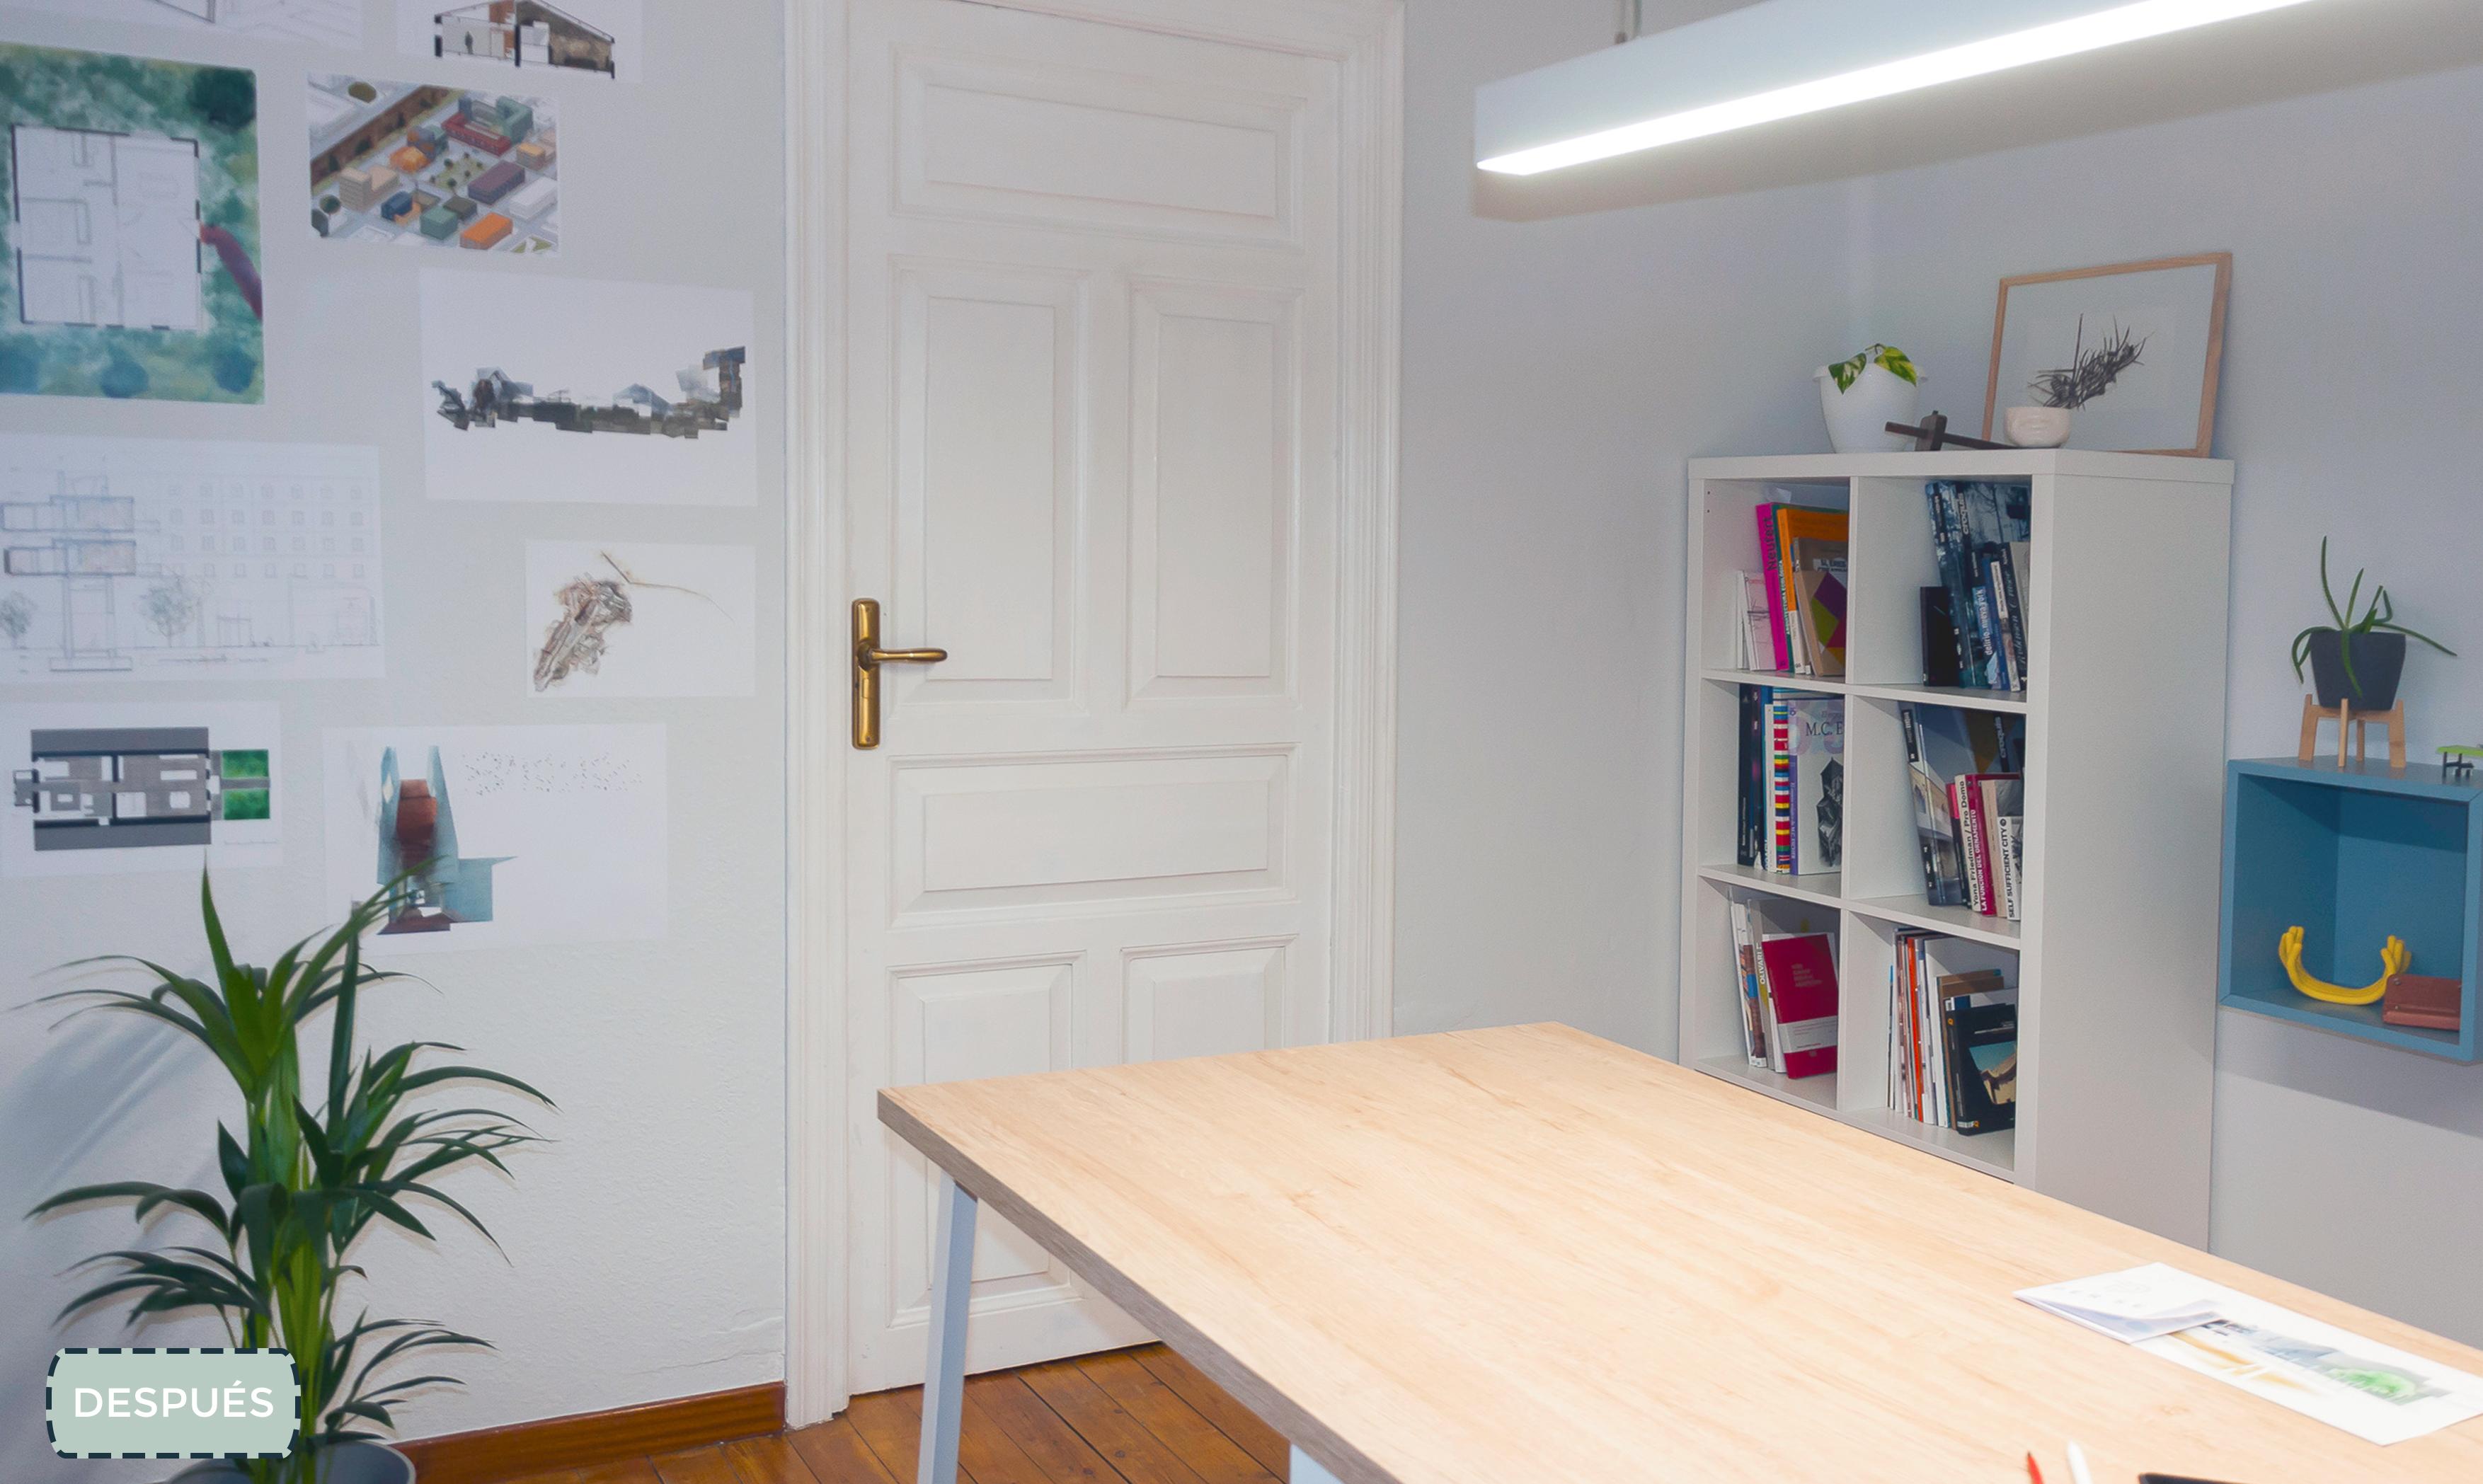 per_se_arquitectura_leon